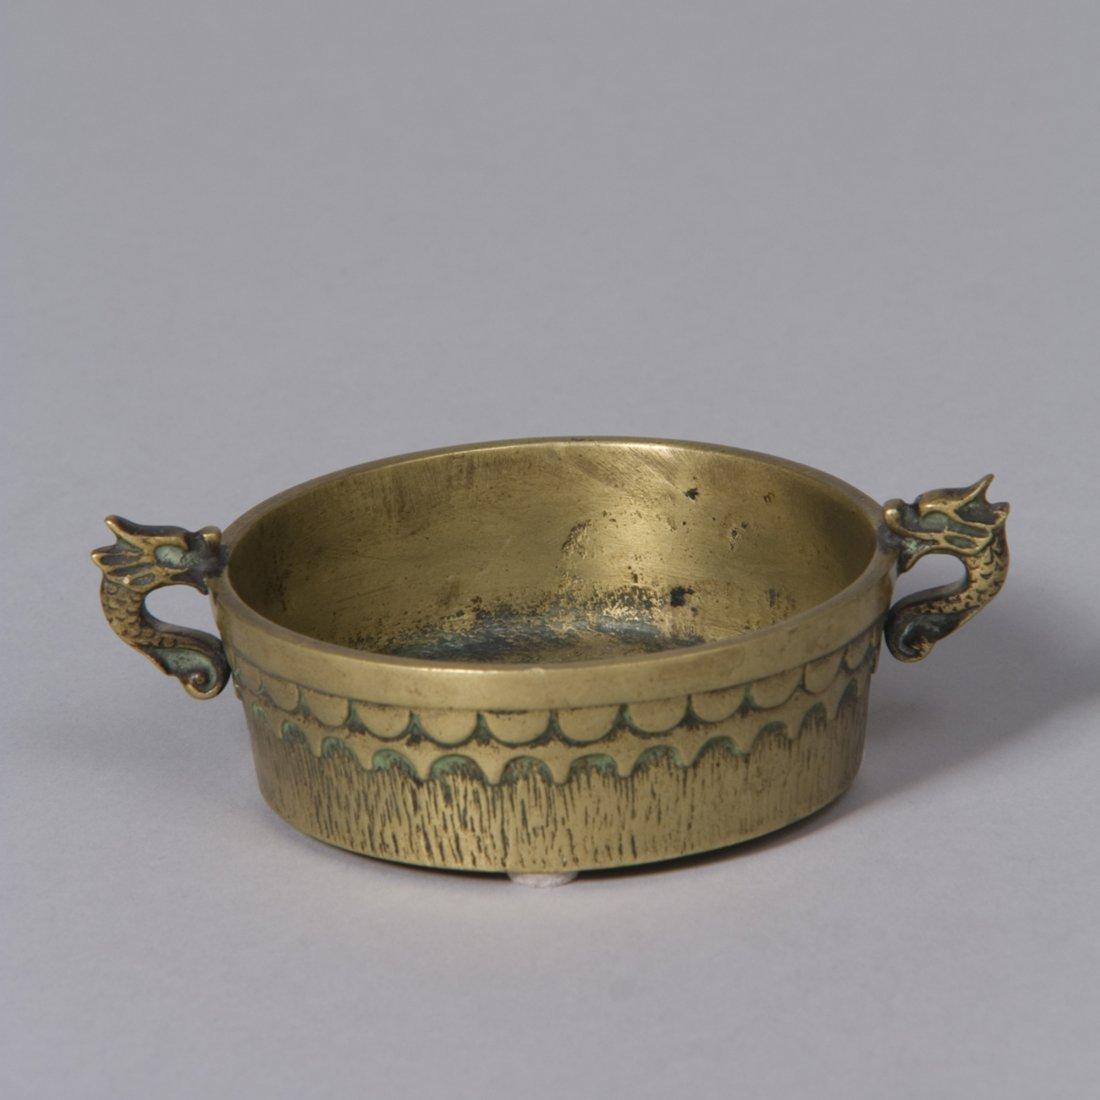 Dragon Bowl by Max Le Verrier